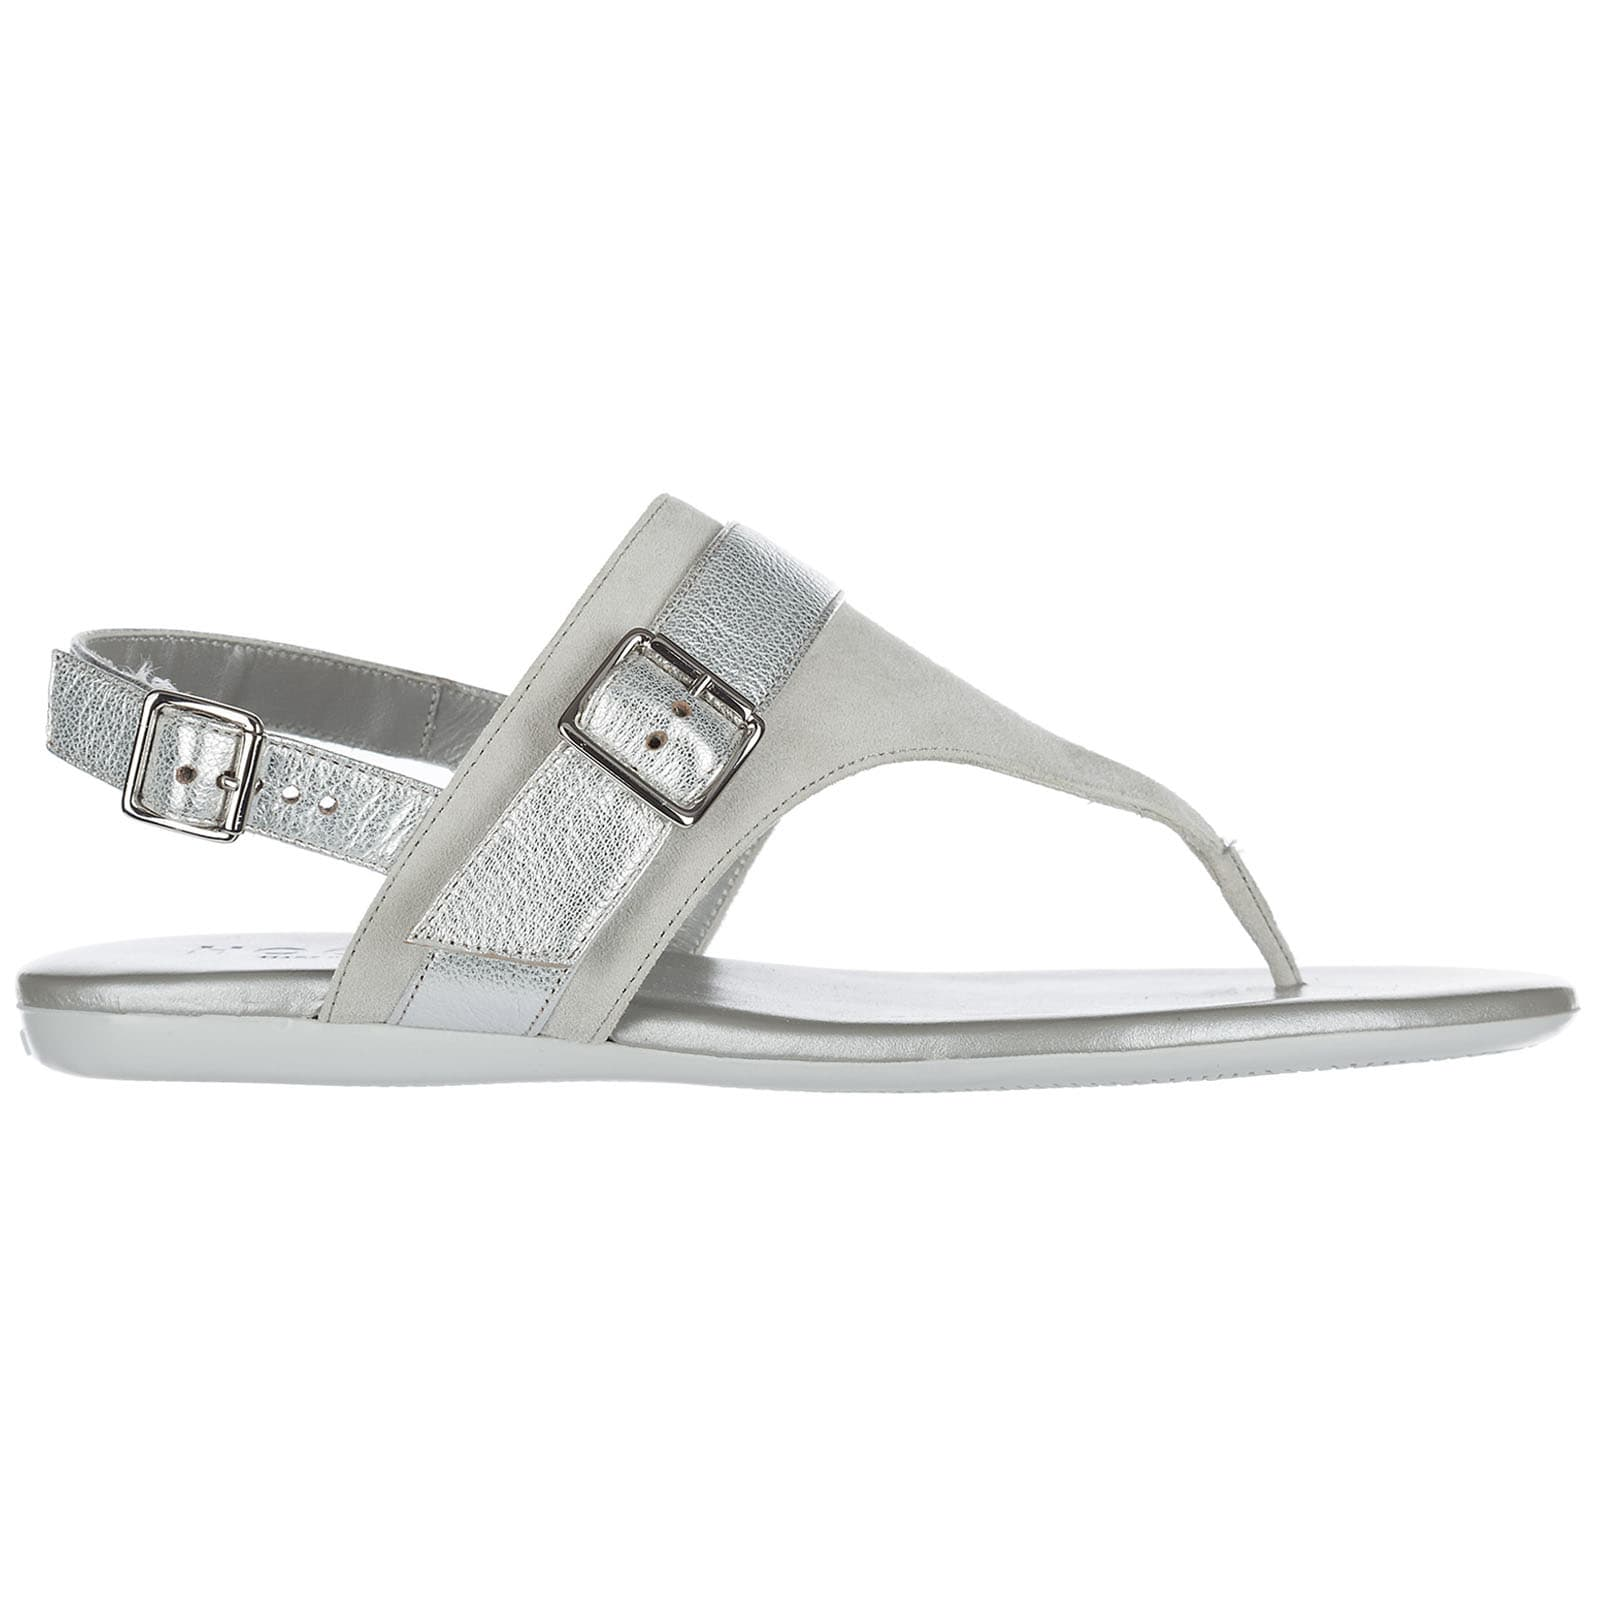 Hogan H133 T-bar Sandals